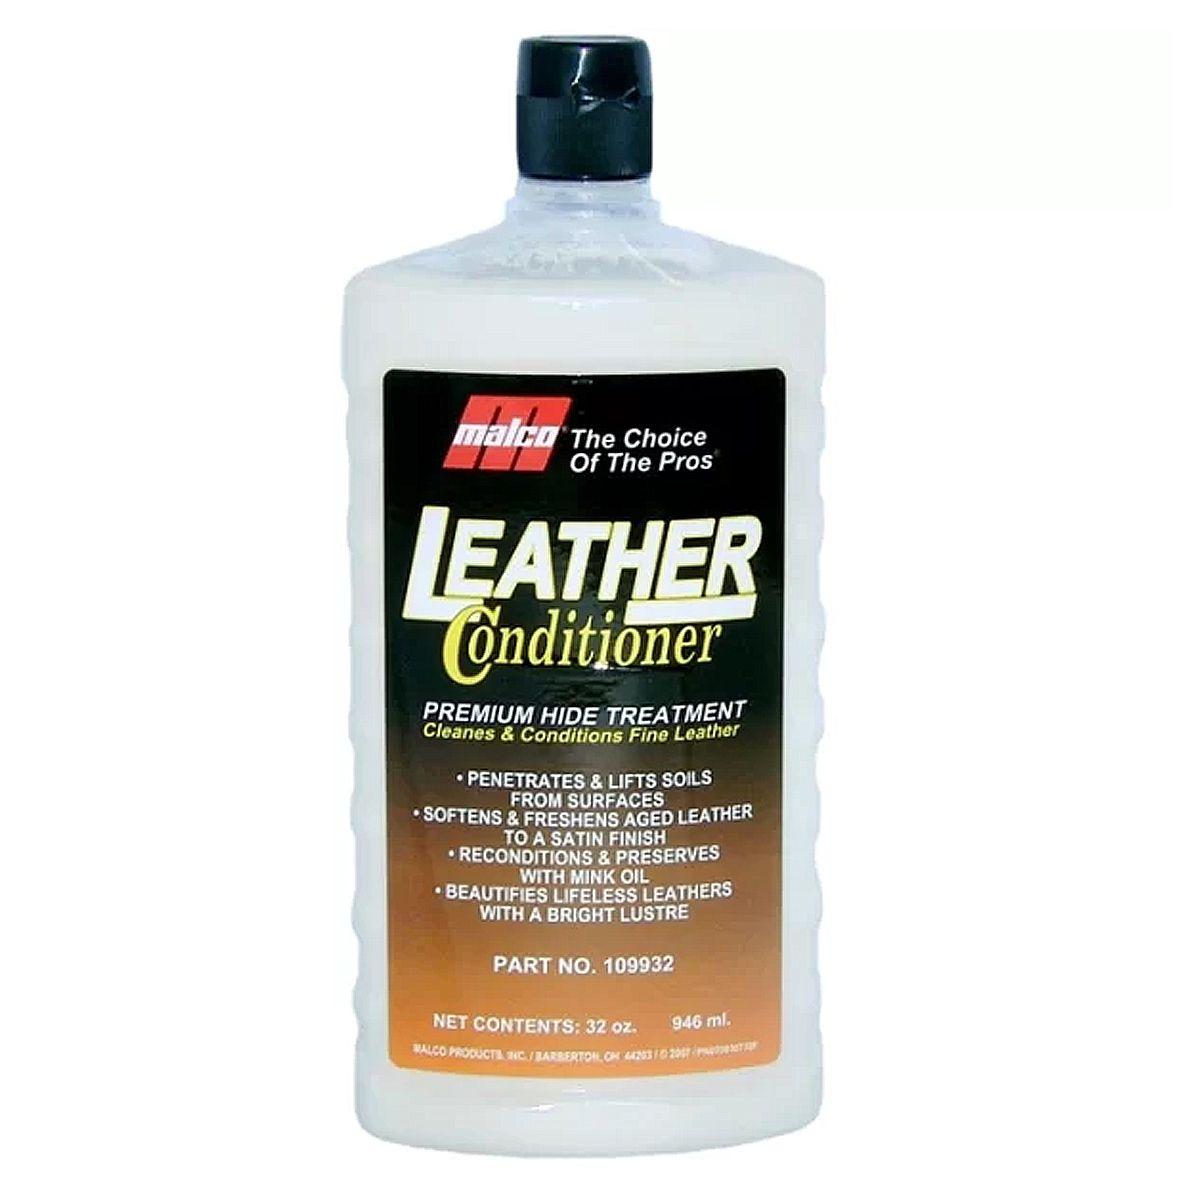 Hidratante de Couro Condicionador Leather Conditioner Malco 946ml